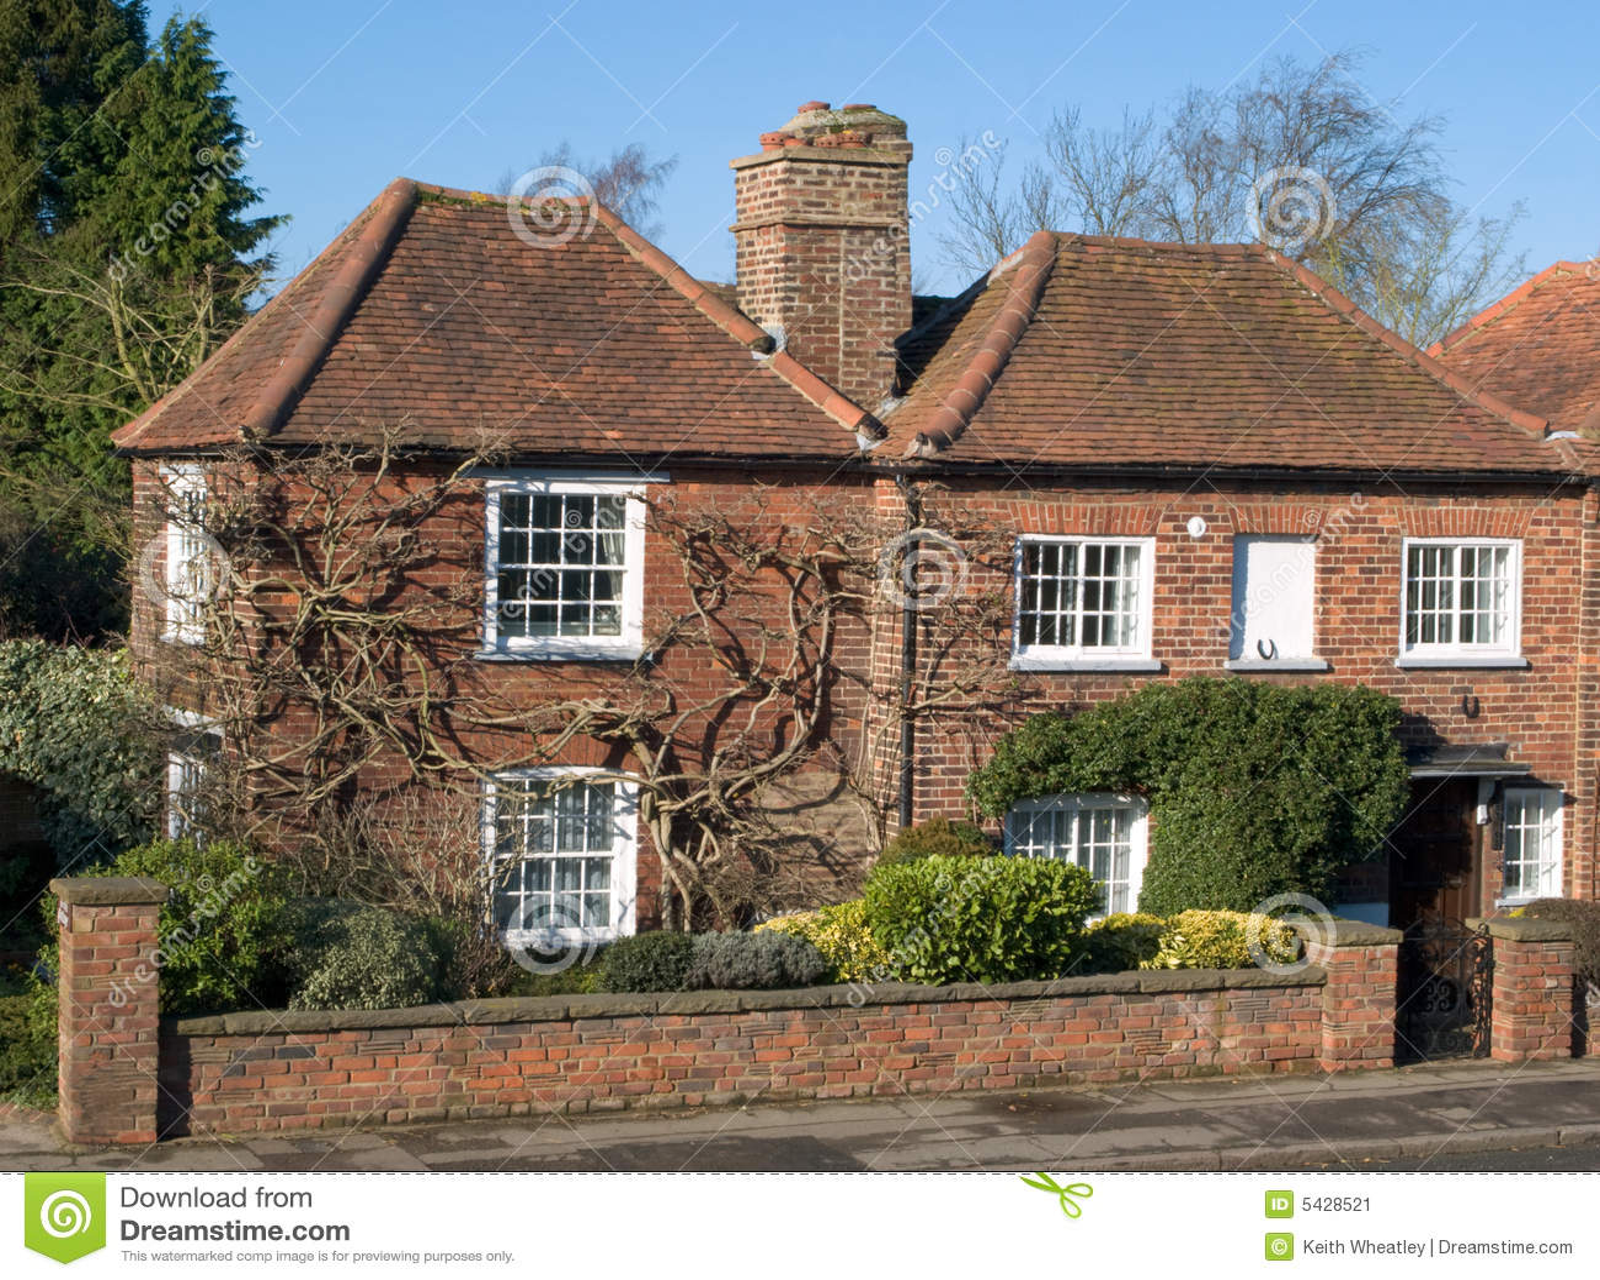 Vieille maison anglaise image stock image du petit for Maison anglaise typique plan